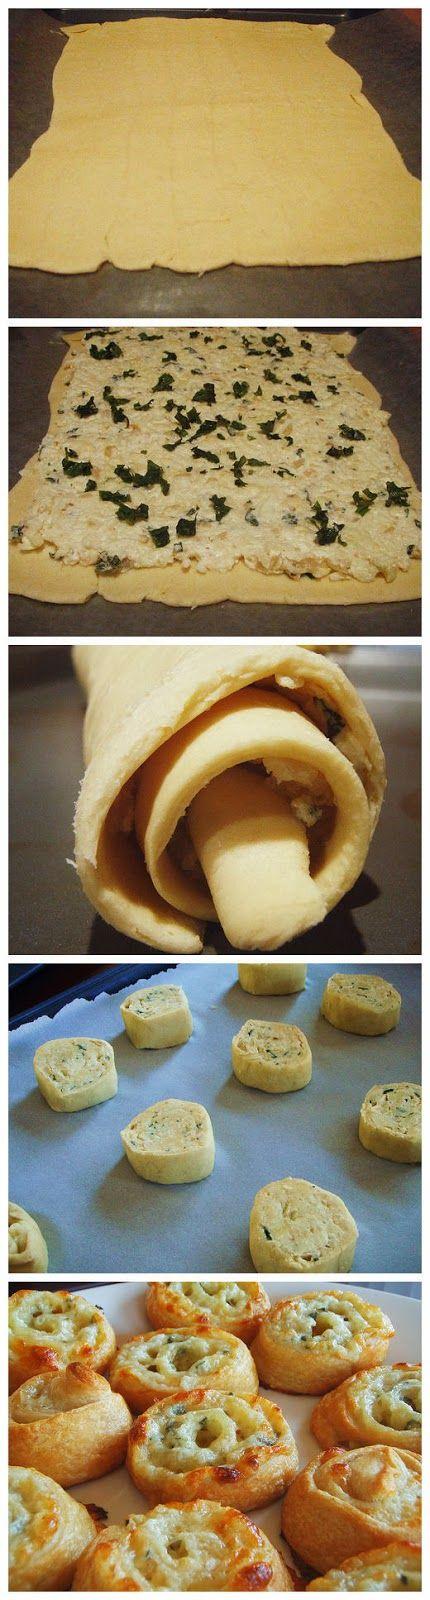 Easy Three Cheese Pinwheel Appetizers